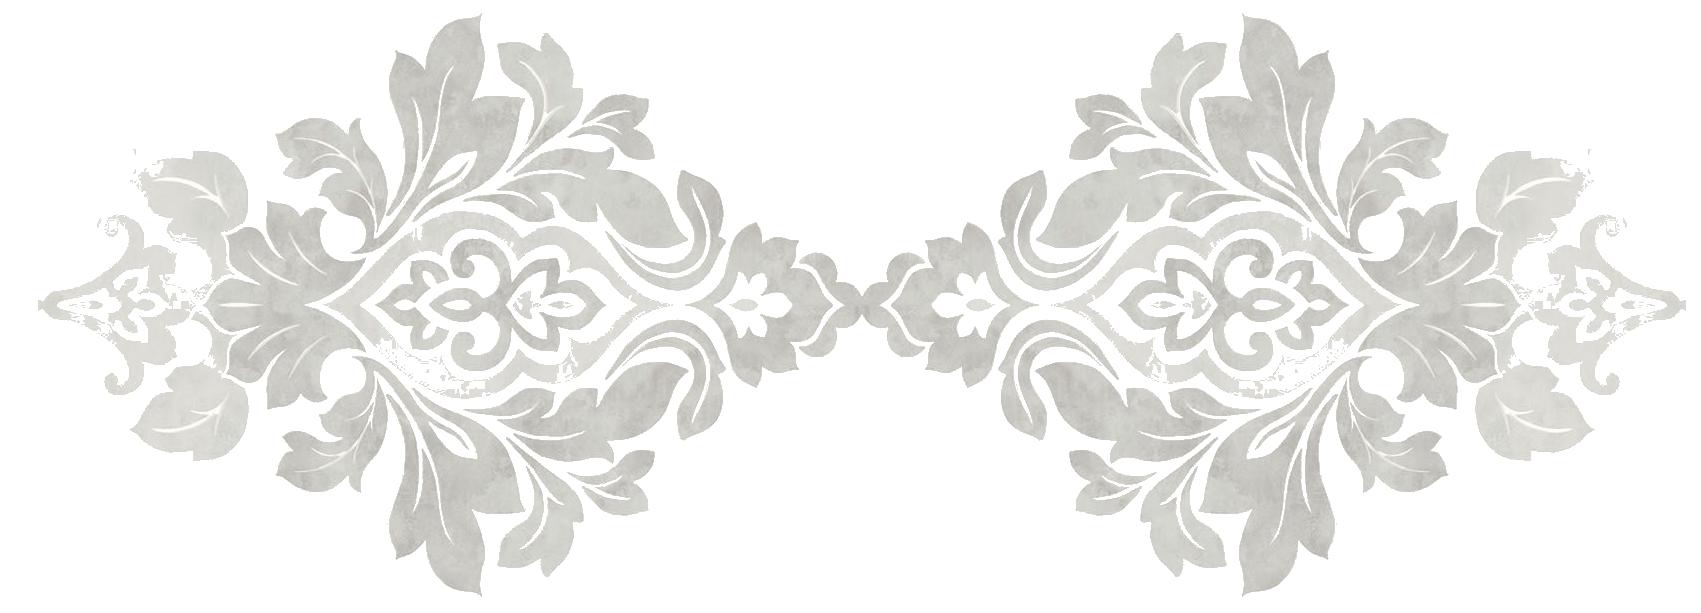 Floral Crest